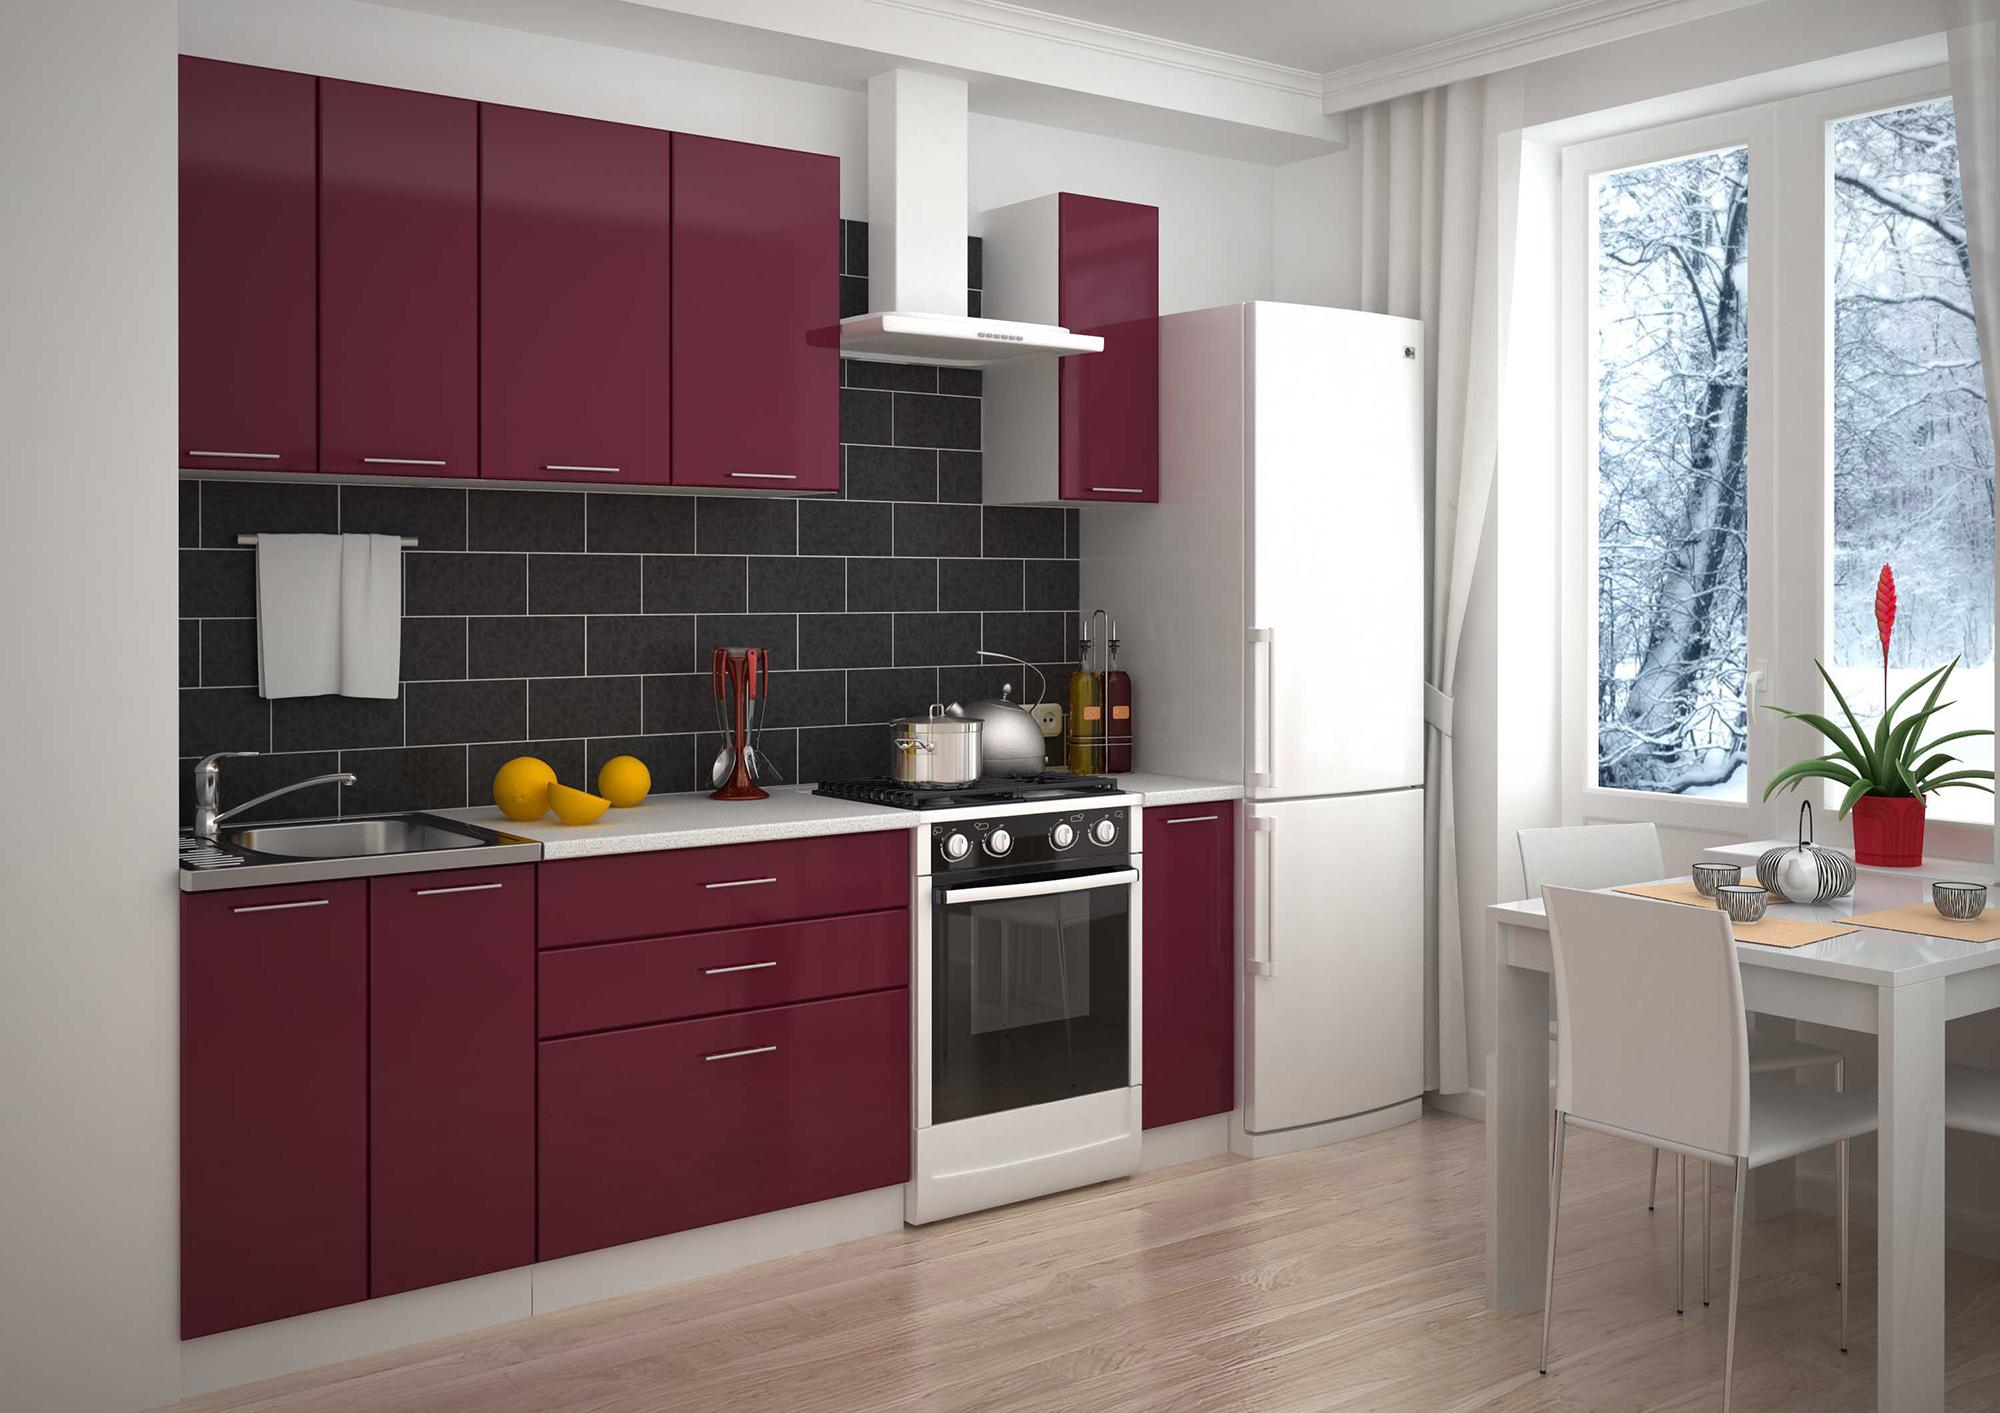 Модульный гарнитур на кухне